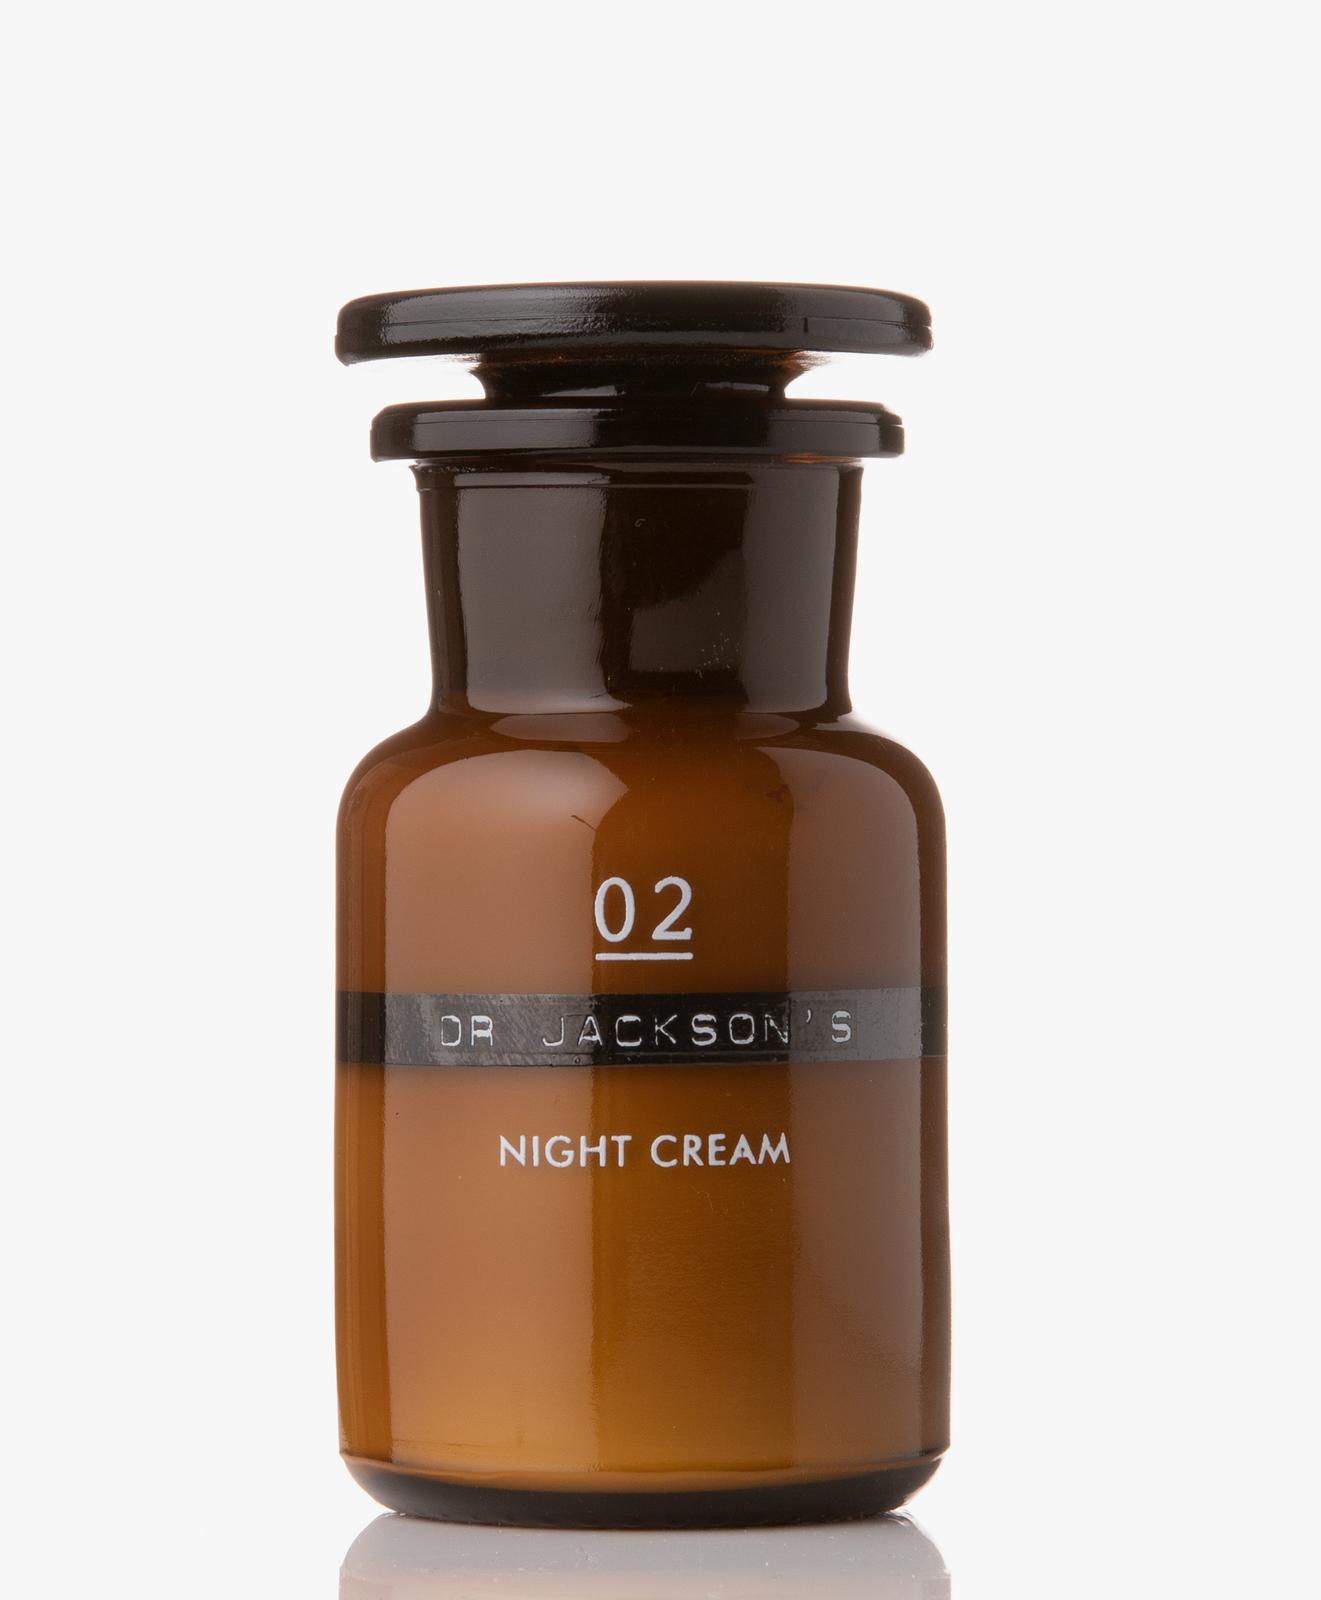 Afbeelding van Dr Jackson's Cream 02 Night Skin